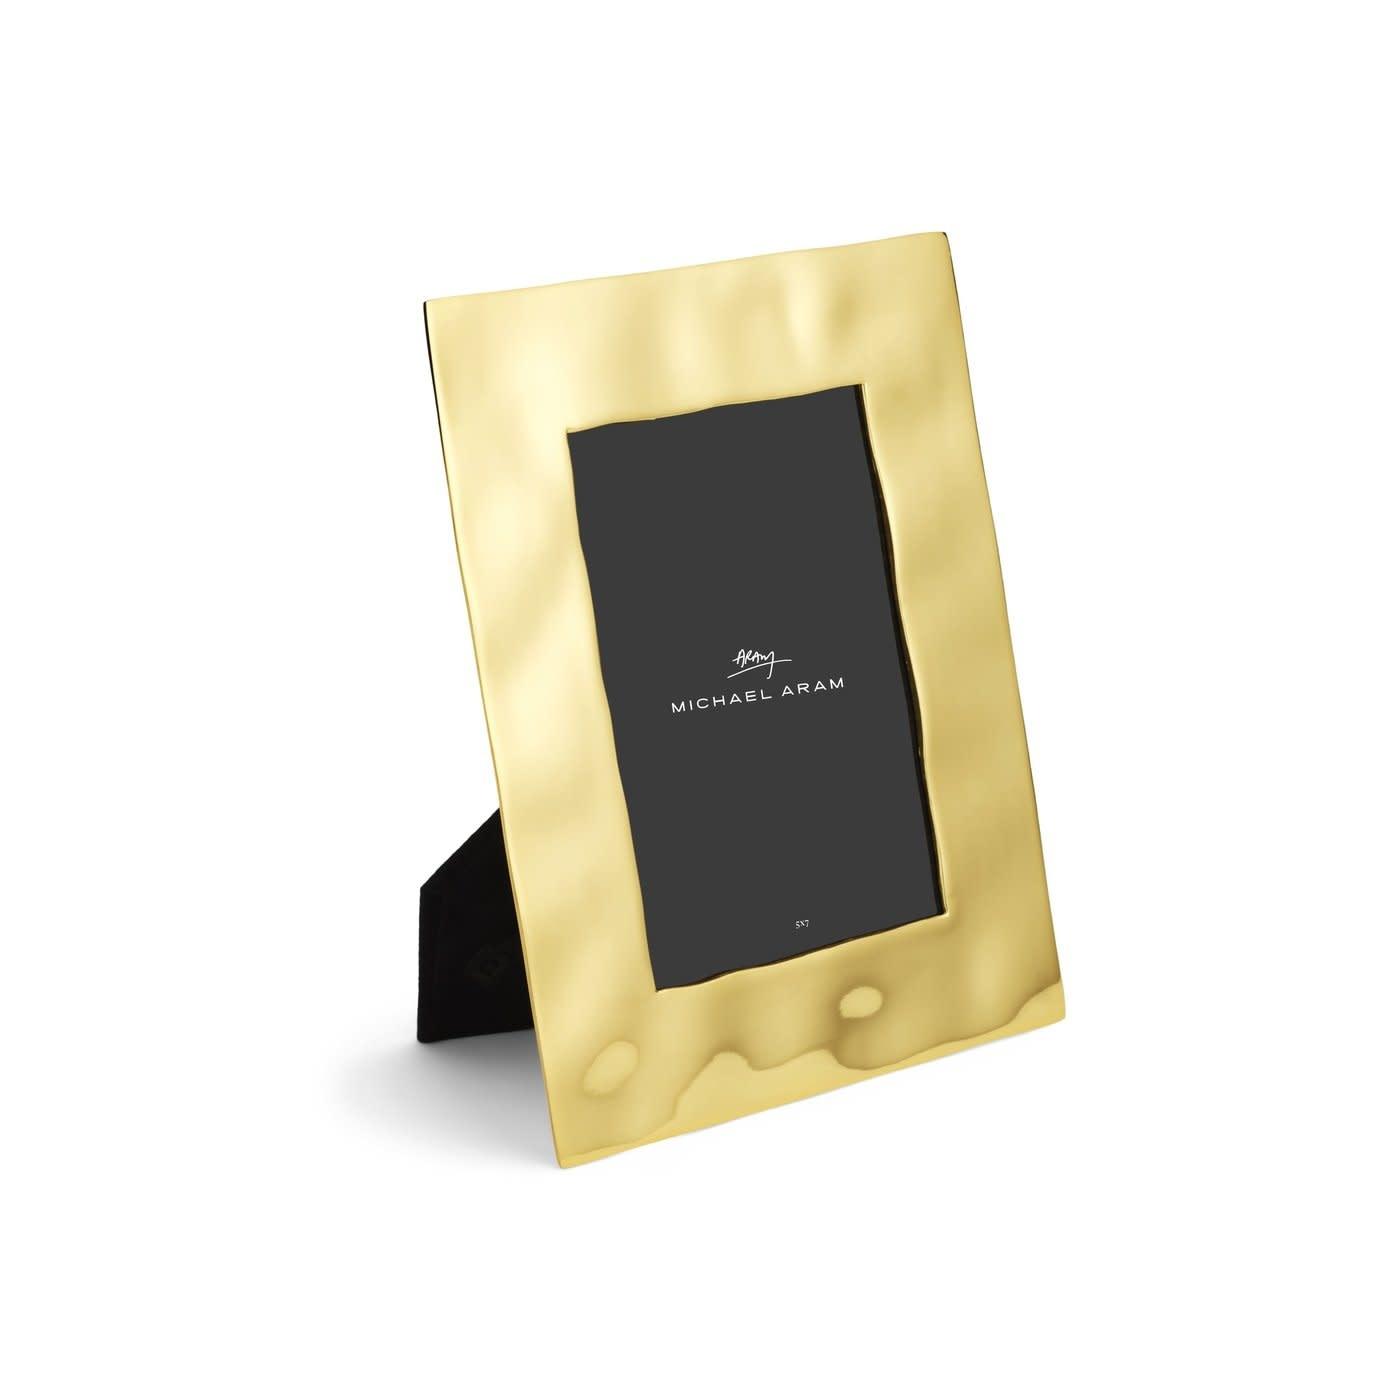 Michael Aram Reflective Frame 5 x 7 Gold